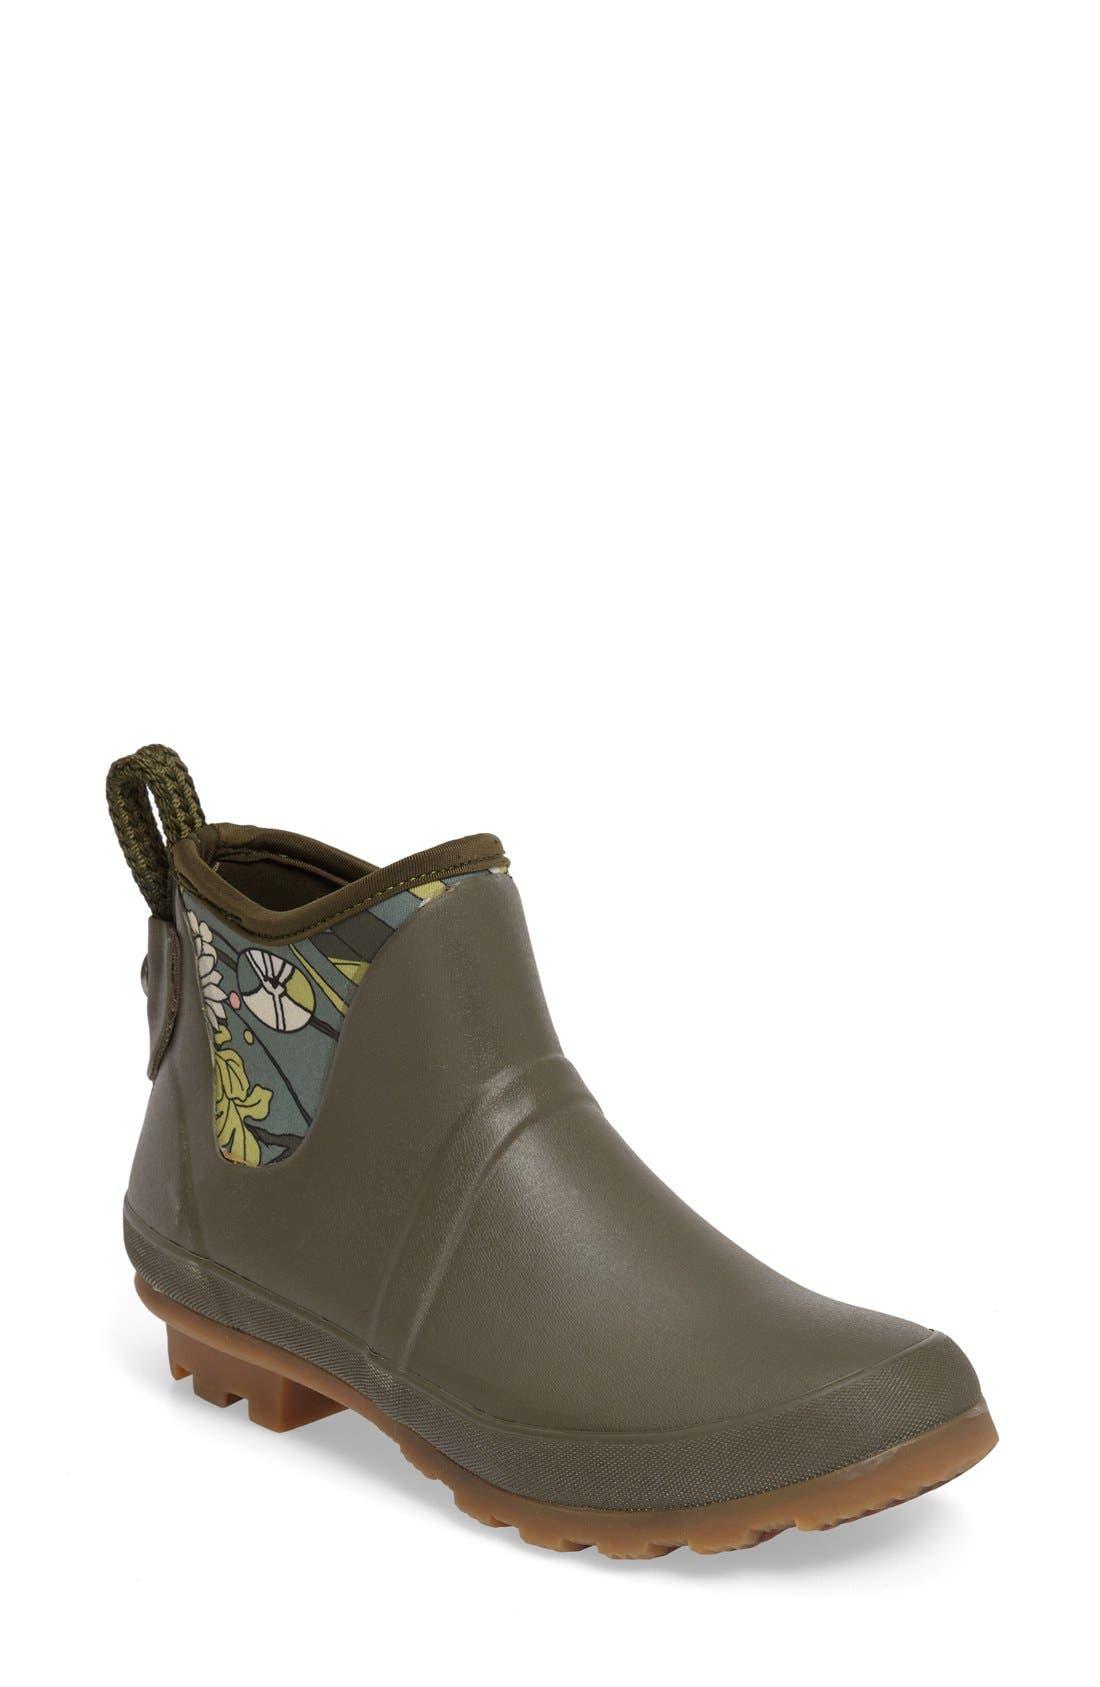 Mano Waterproof Rain Boot,                         Main,                         color, Olive Flower Power